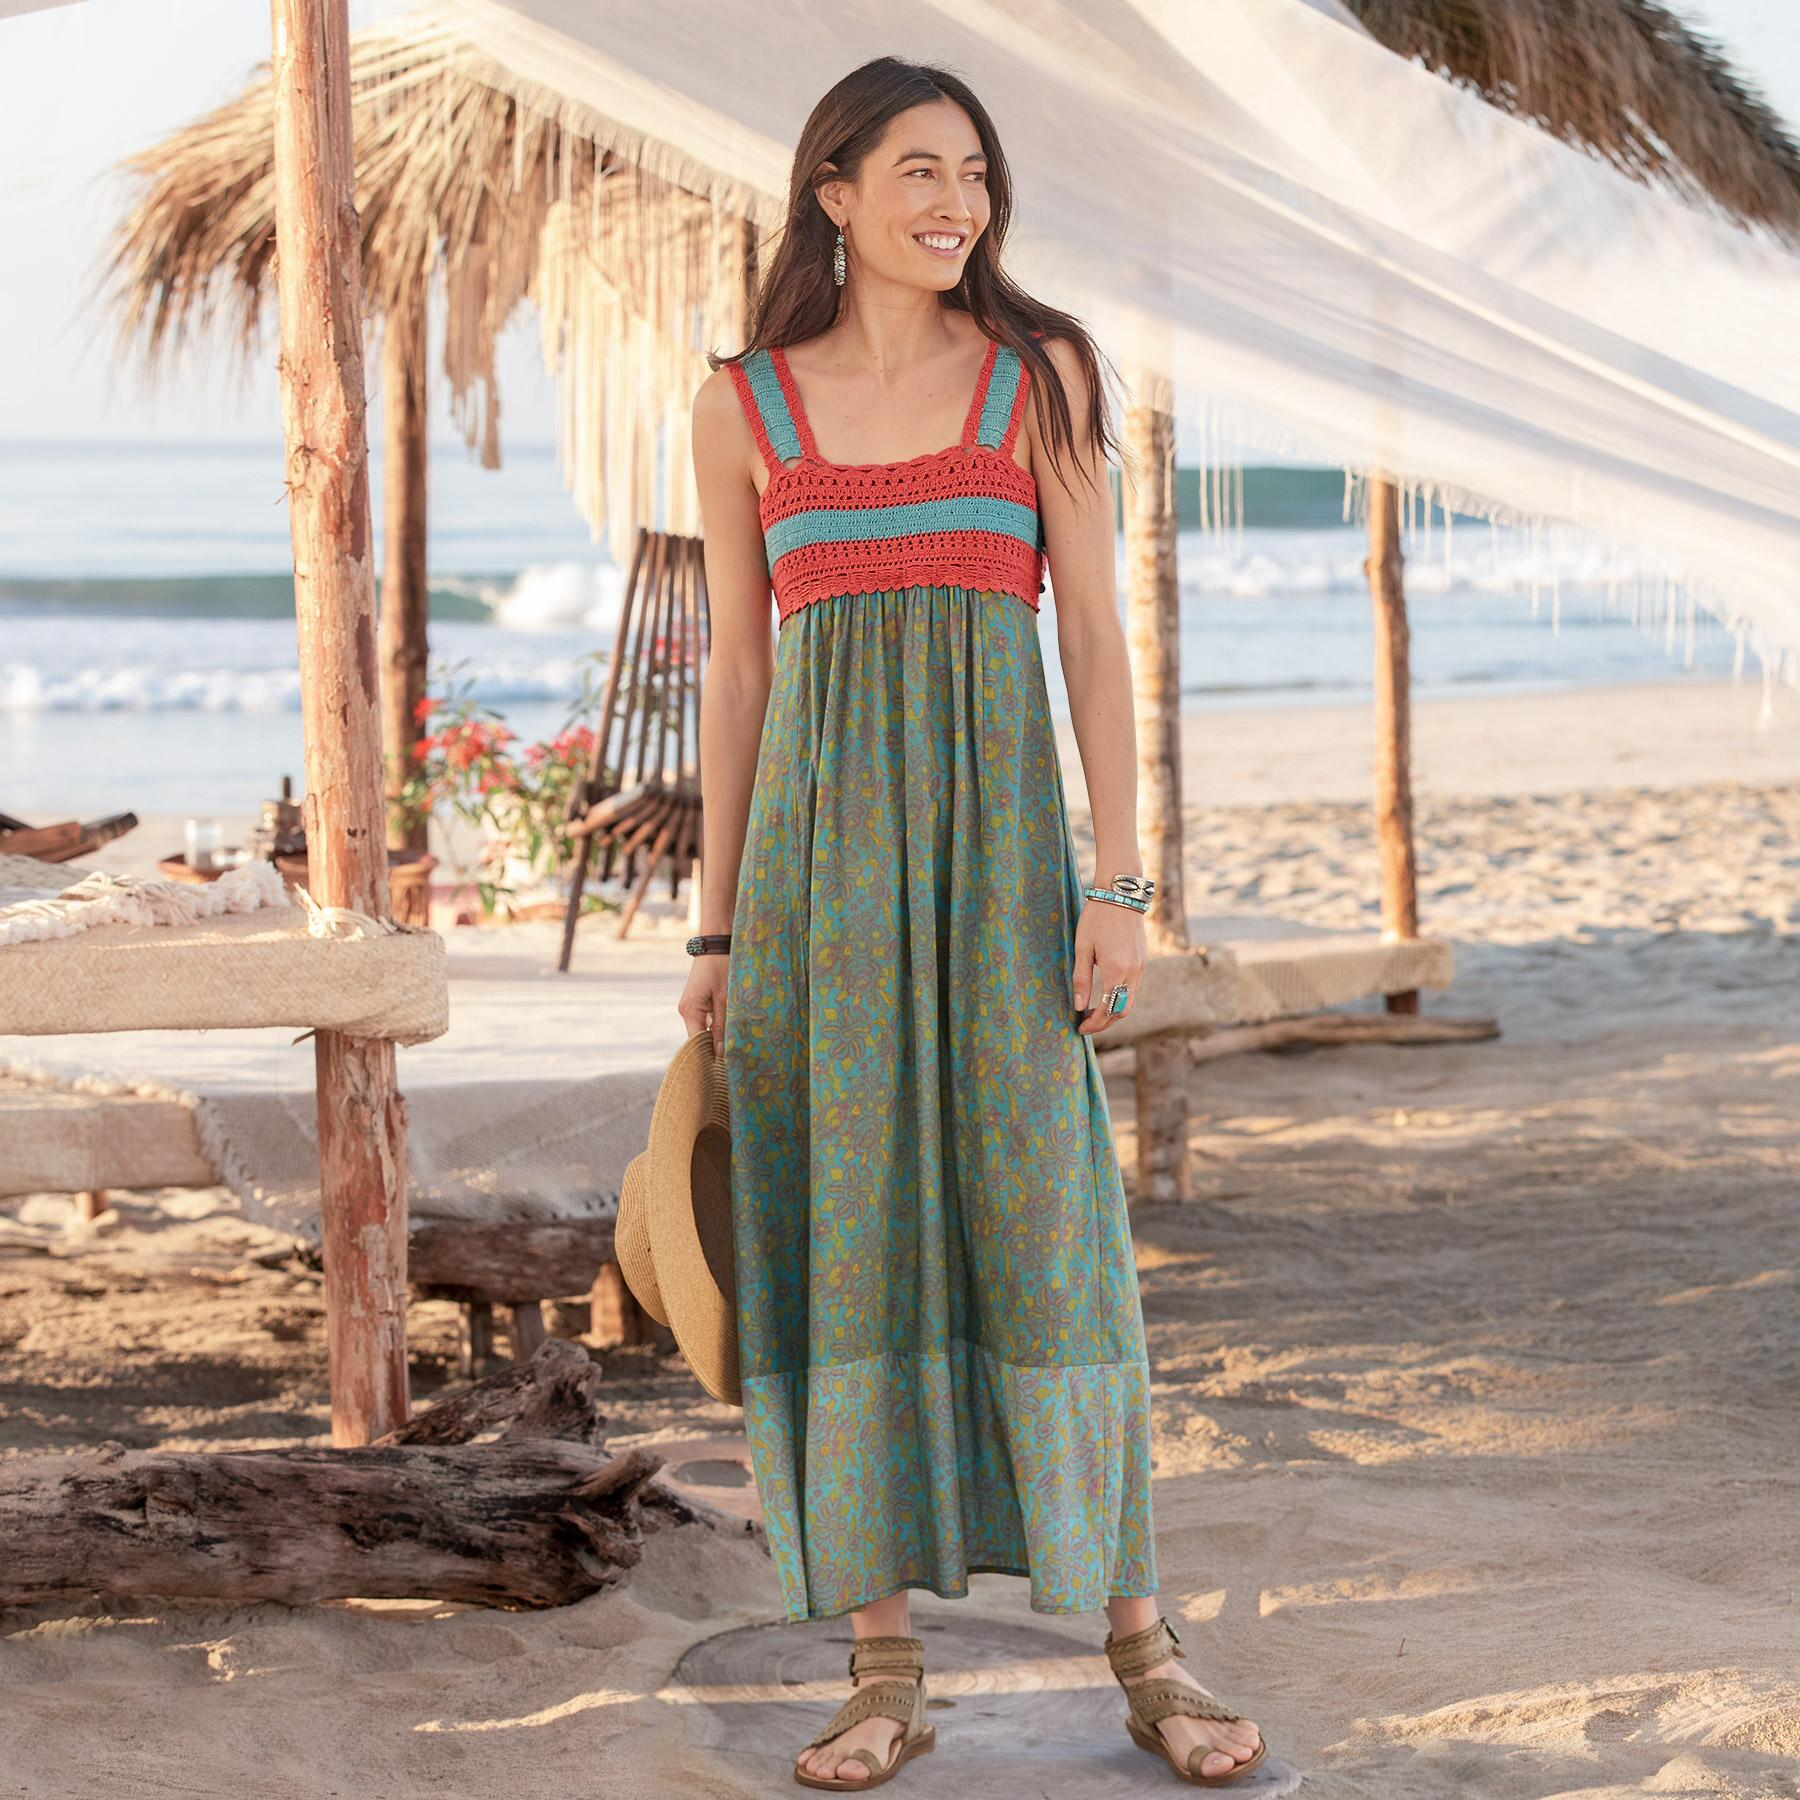 UNDER THE SUN DRESS - PETITES: View 1